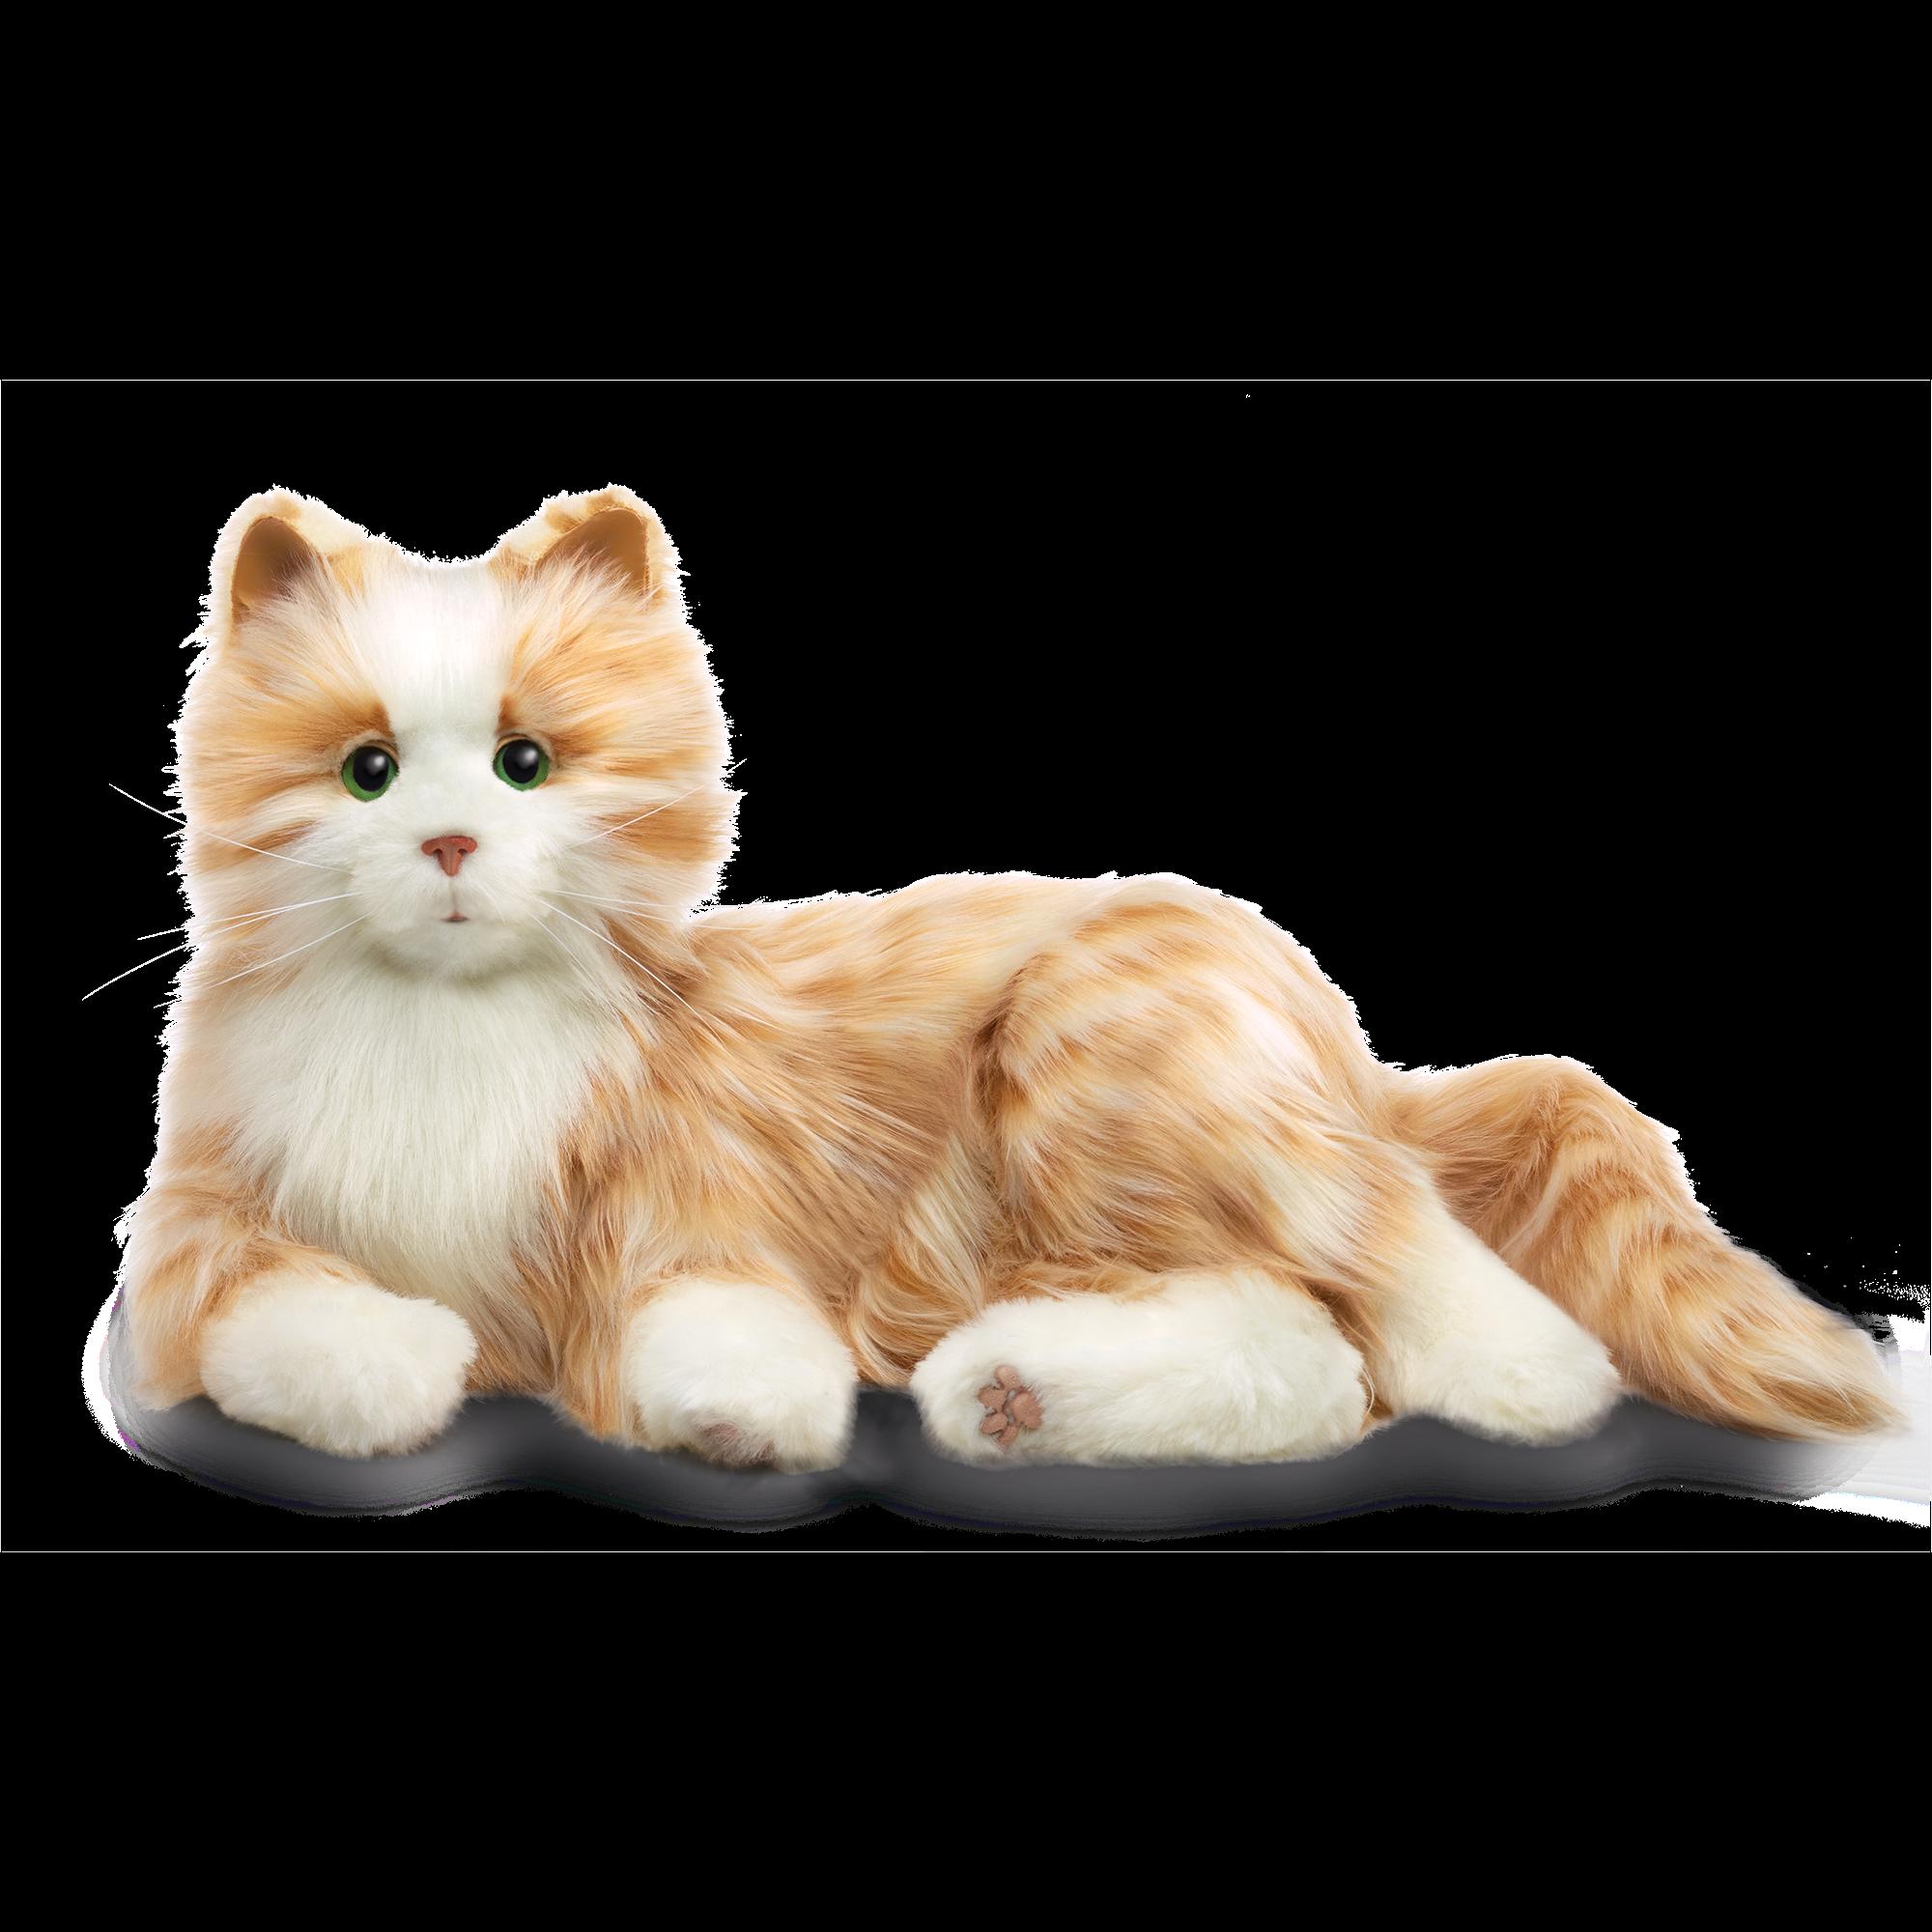 Joy For All Orange Tabby Cat Orange Tabby Cats Tabby Cat Tabby Cat Pictures